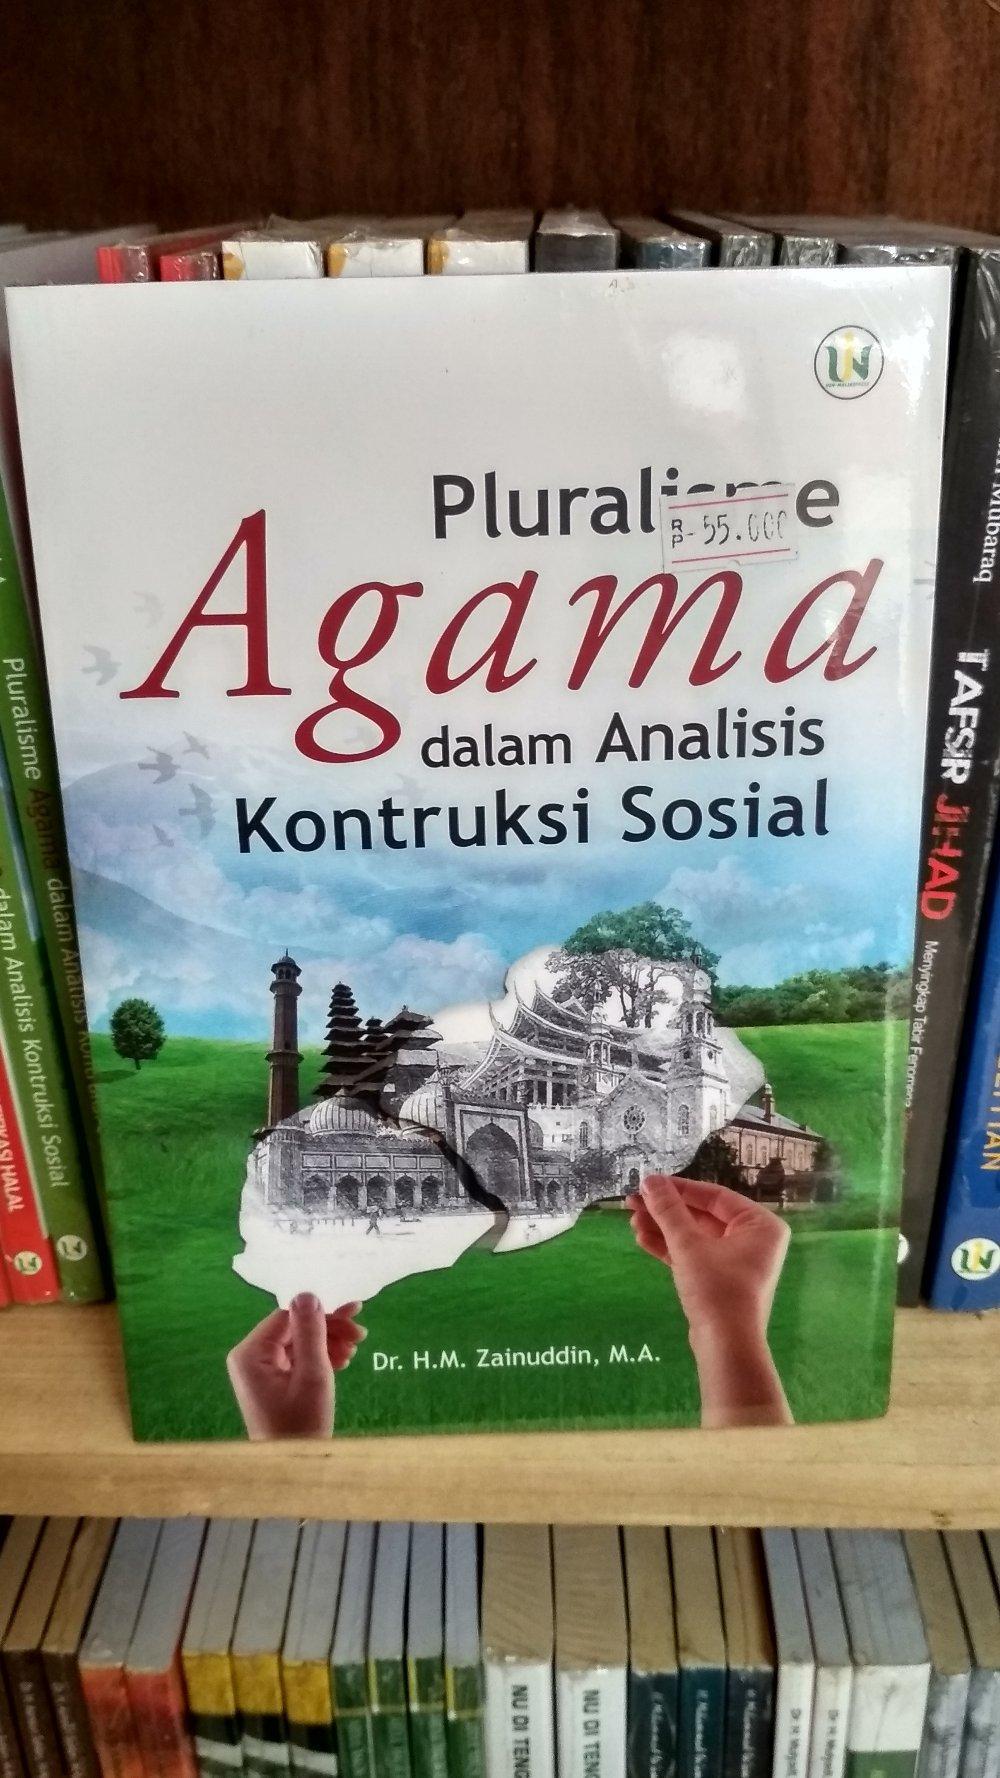 Pluralisme Agama Dalam Analisis Kontruksi Sosial - Zainuddin By Metro Bookstore Malang.